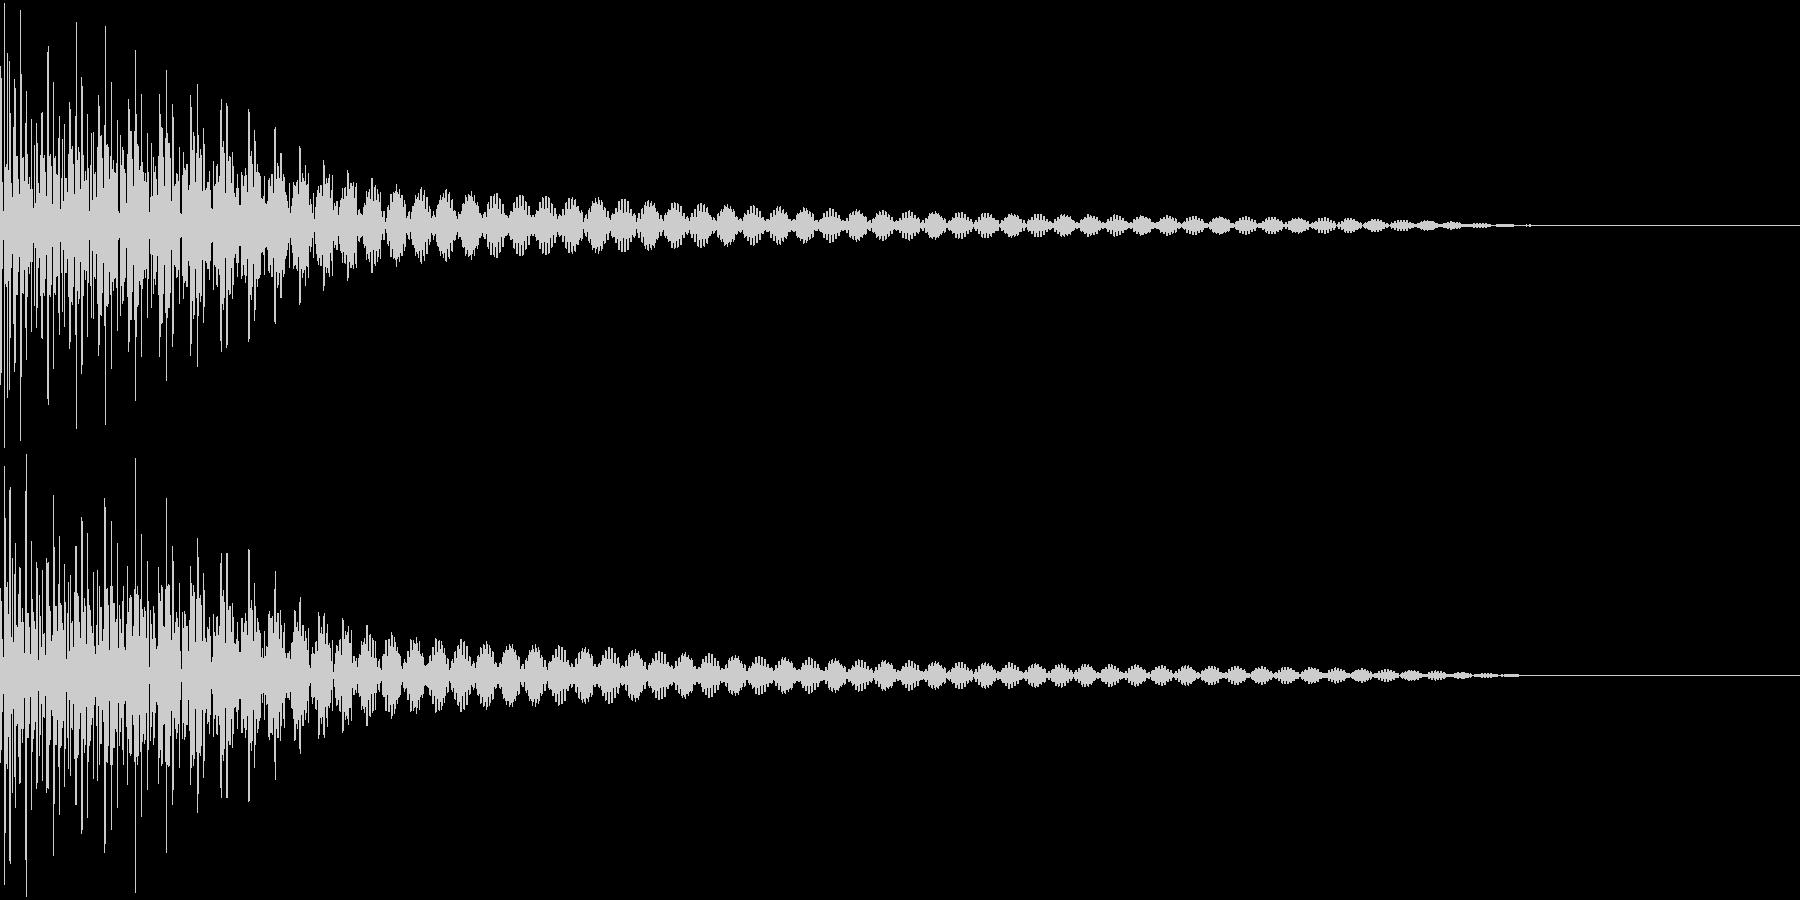 Cancel キャンセルコマンドSE 1の未再生の波形